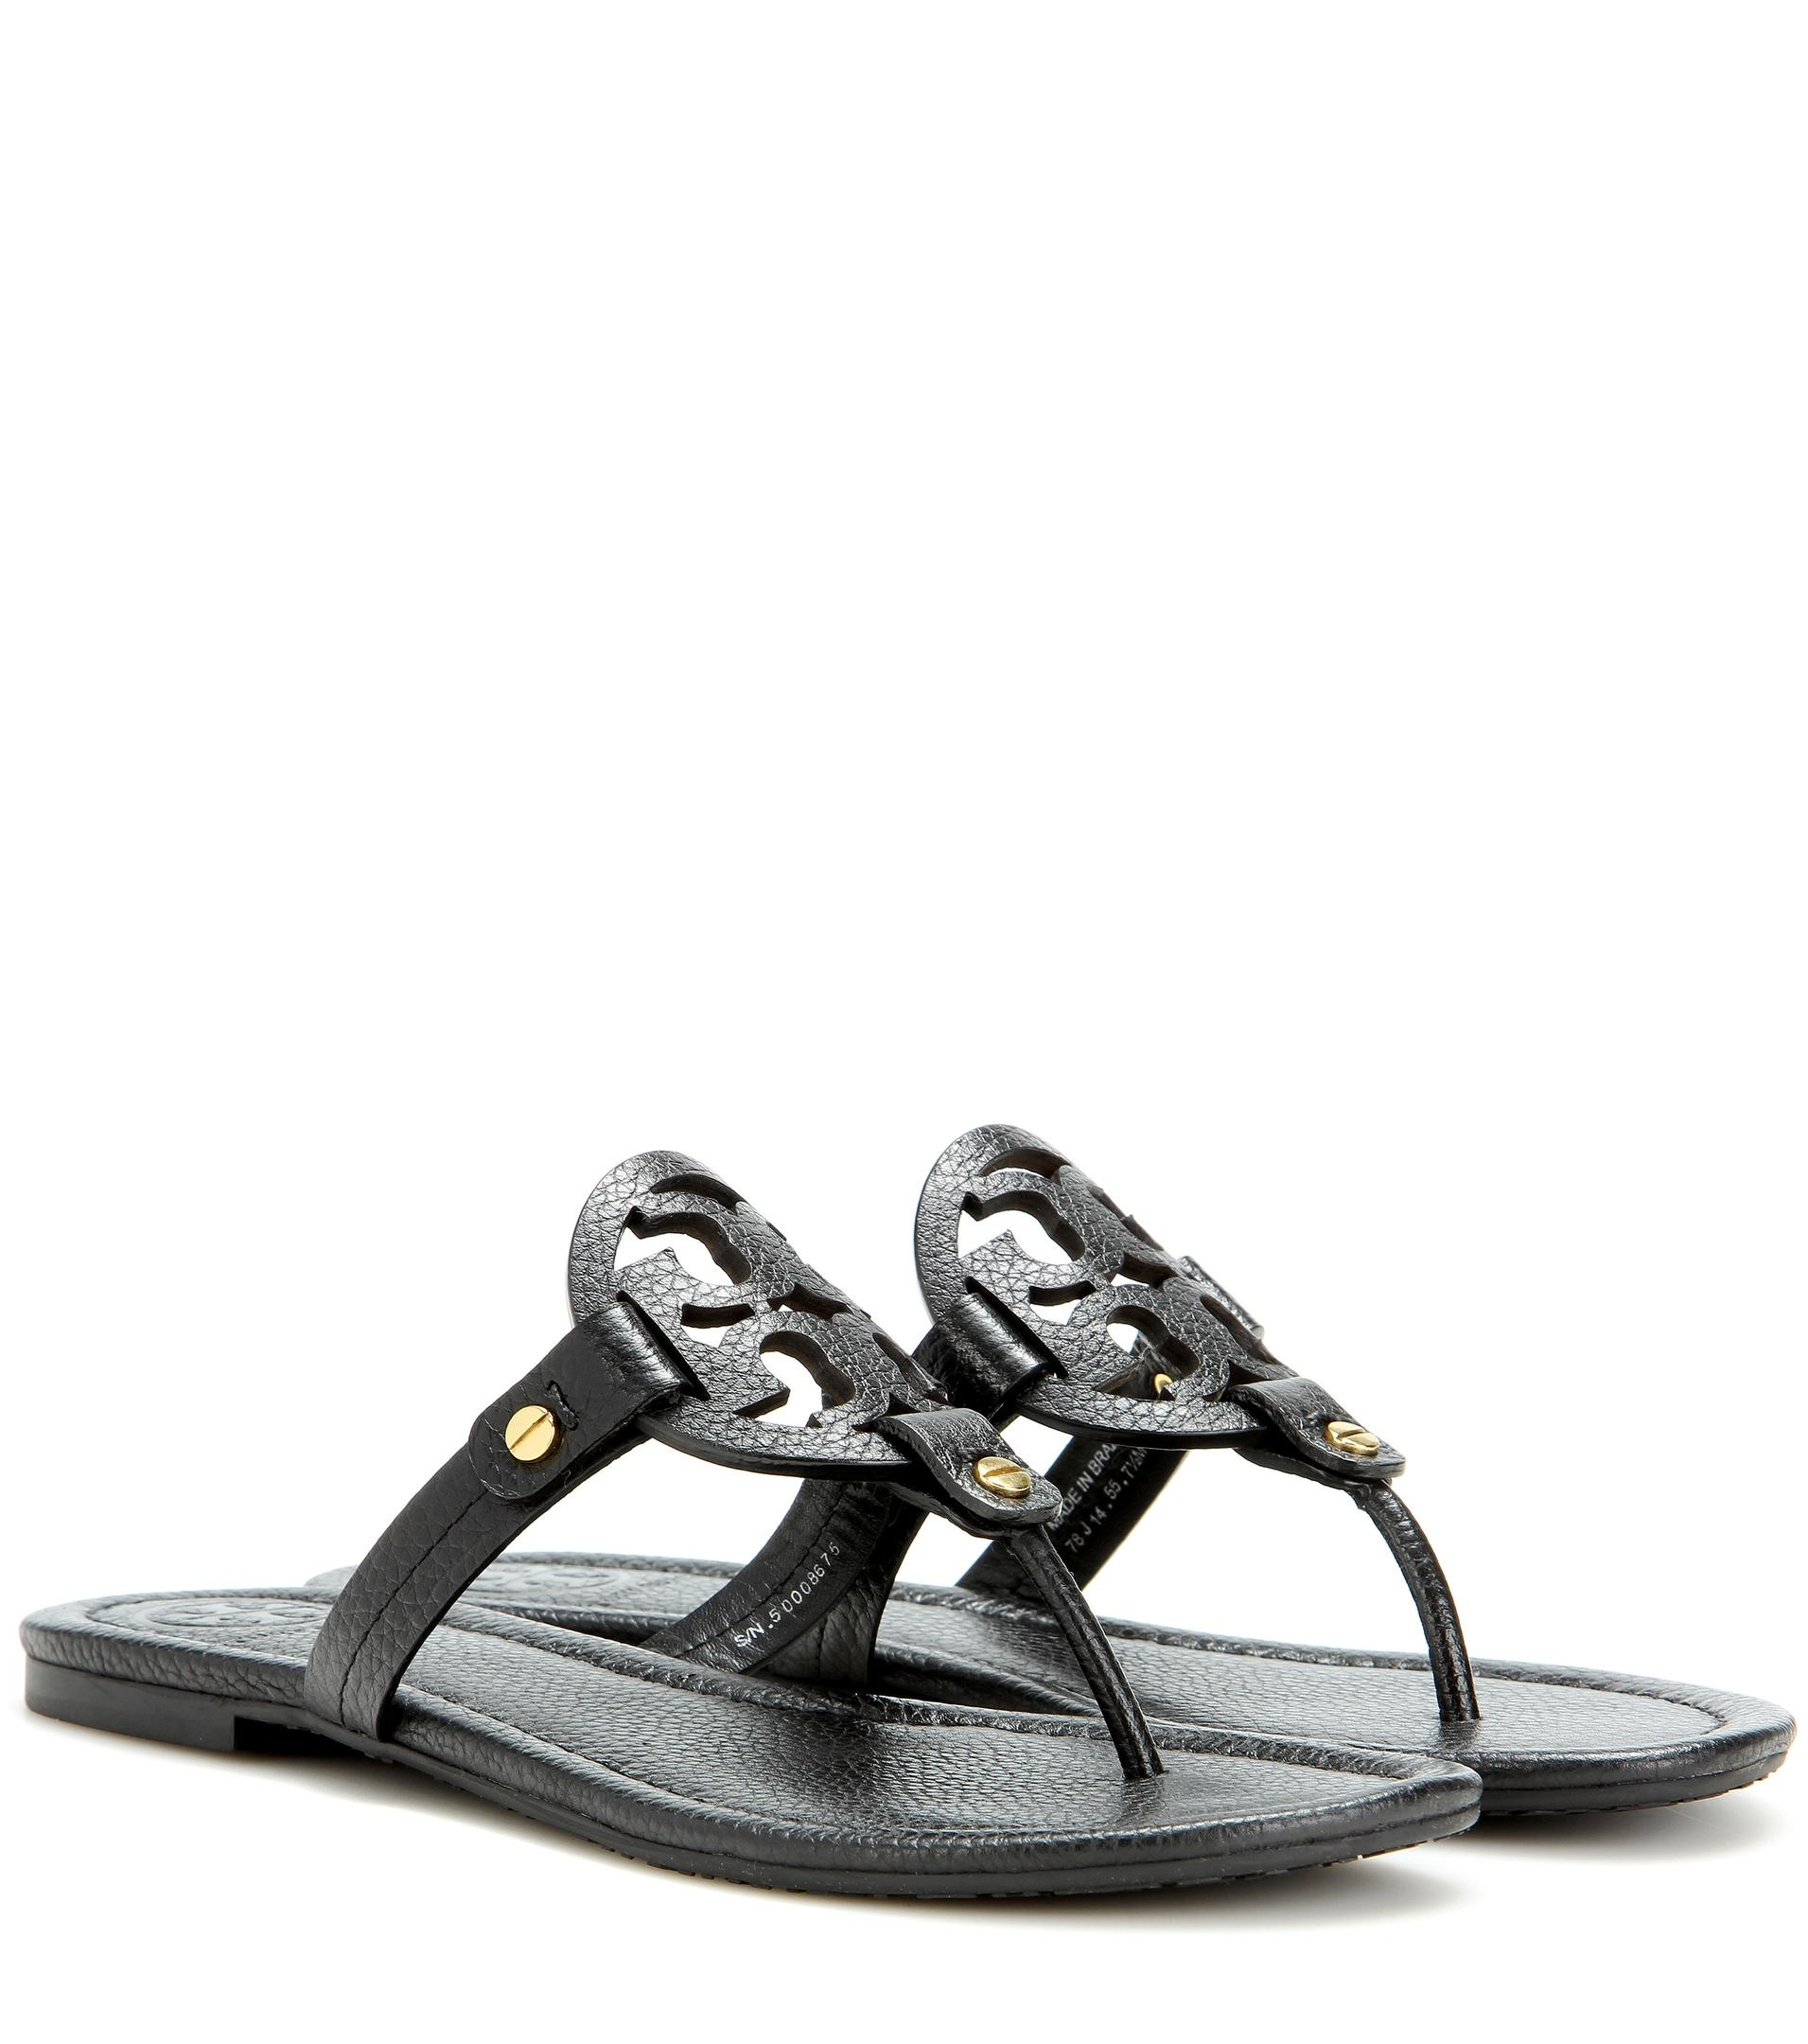 tory burch miller leather sandals in black lyst. Black Bedroom Furniture Sets. Home Design Ideas